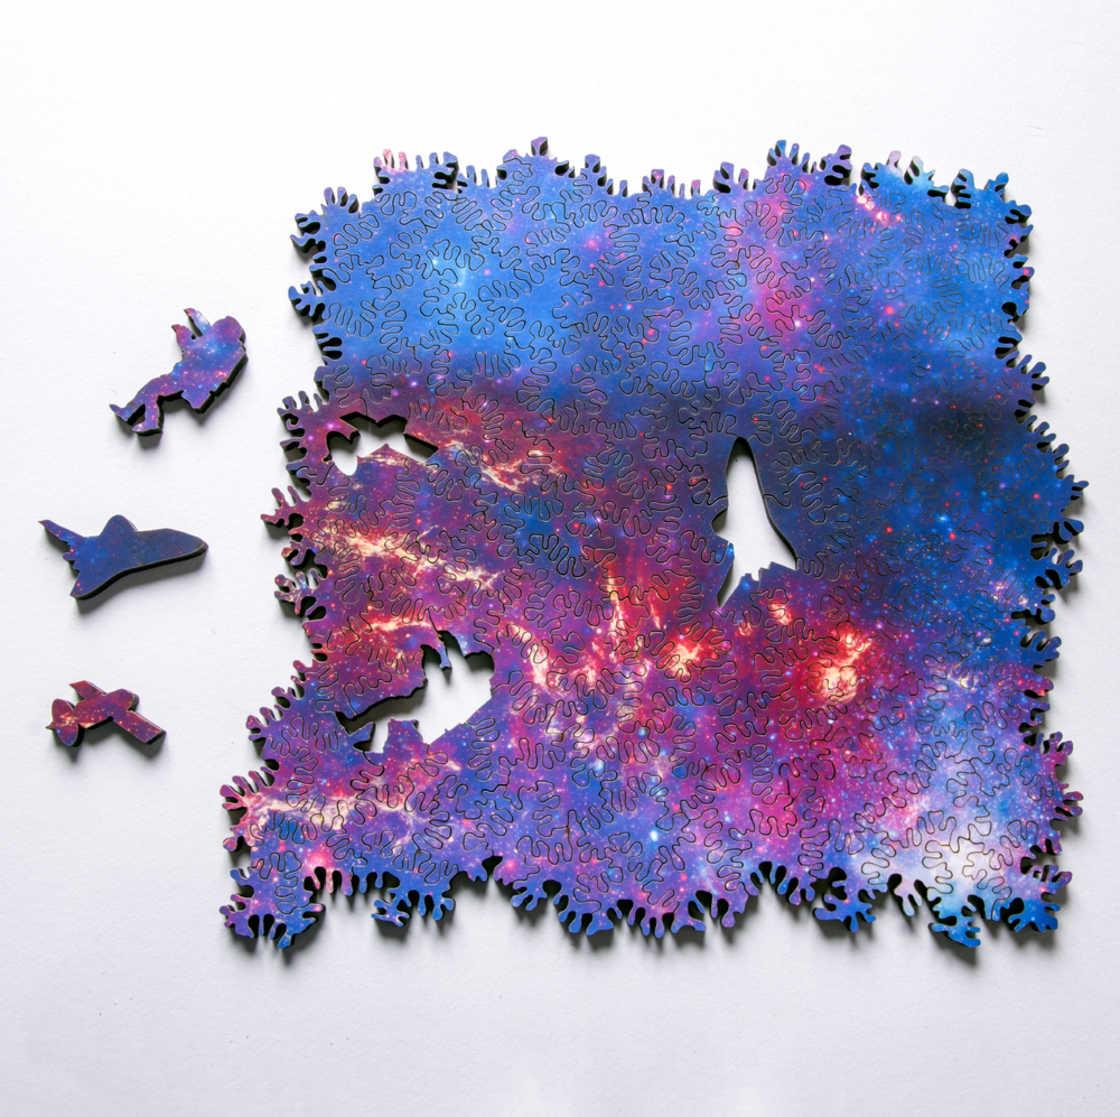 infinite-galaxy-puzzle-2